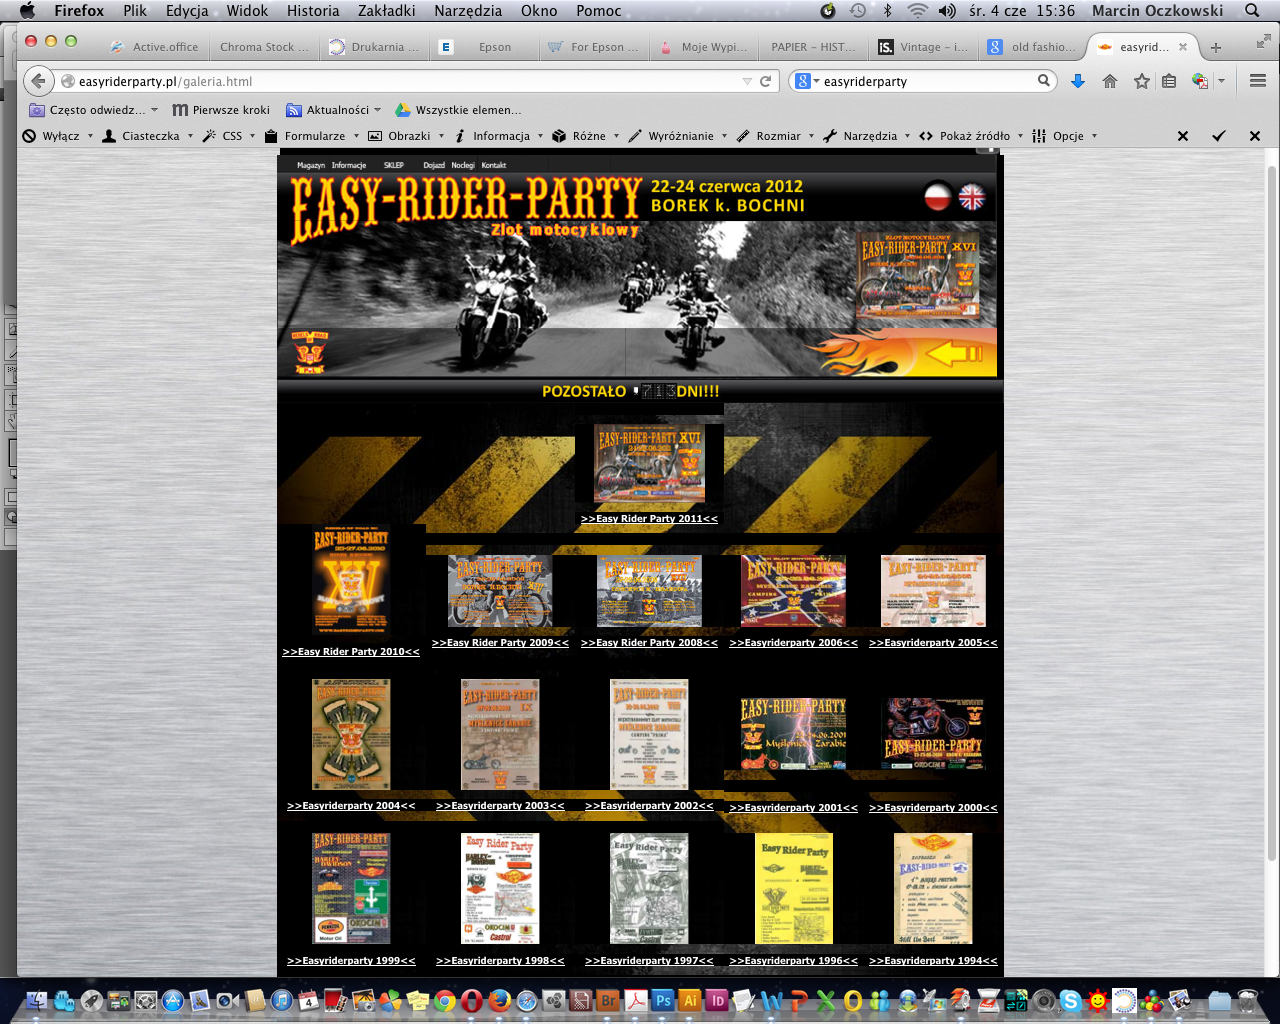 Zrzut ekranu 2014-06-4 o 15.36.26